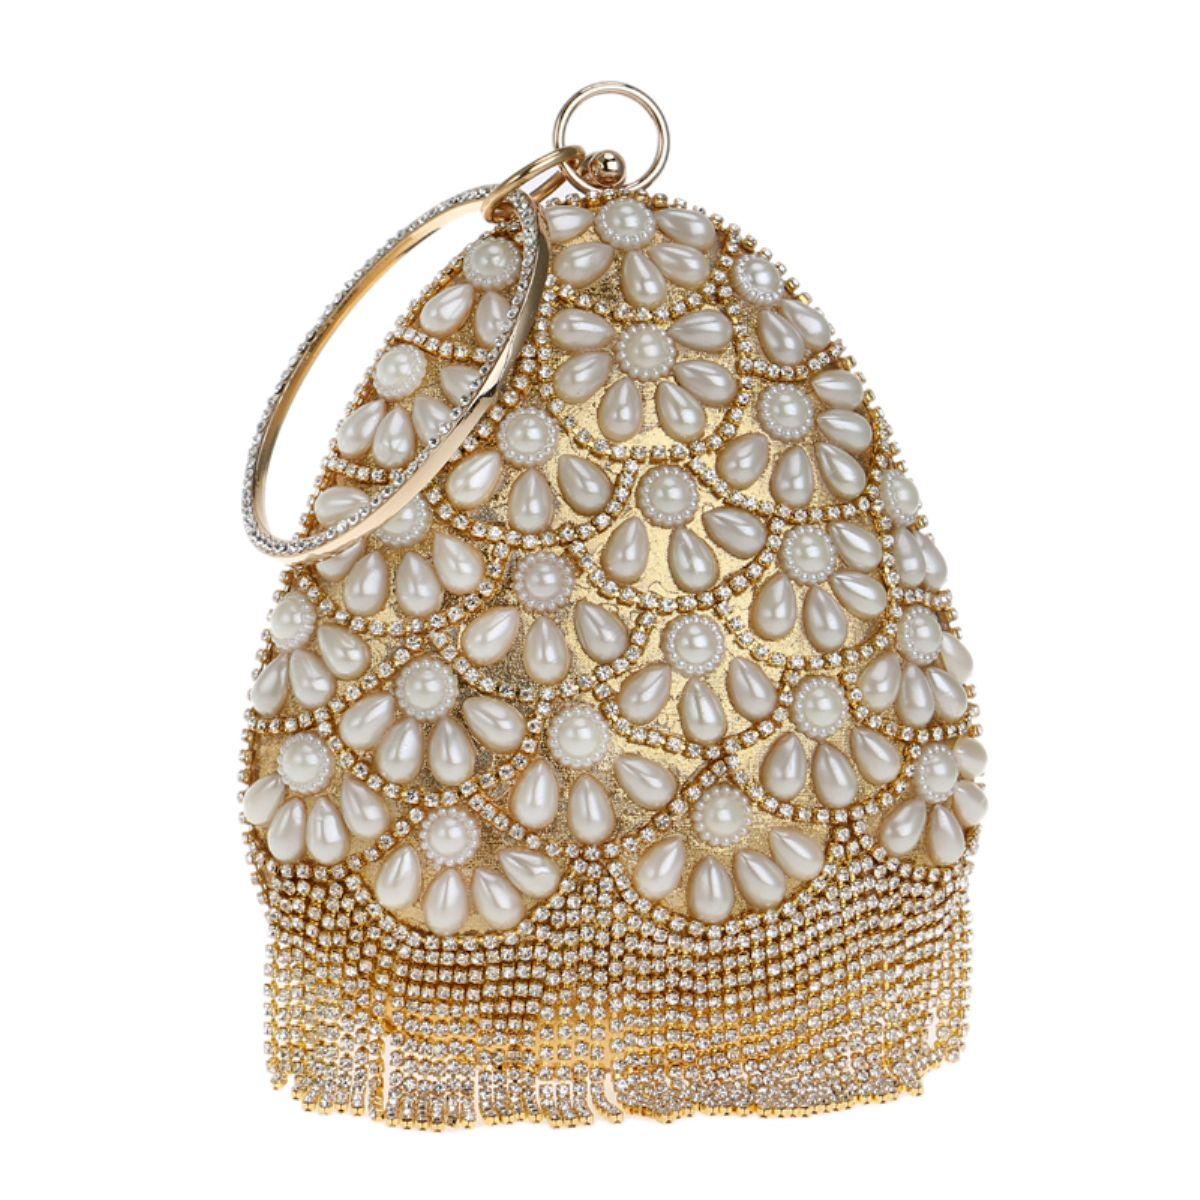 New Bucket Shaped Pearl Diamond Tassel Women Evening Bag Lady Beaded  Rhinestones Clutch Chain Shoulder Bag Handbag For Party Wedding Dinner  Handbags Brands ... 087a6c316b6f